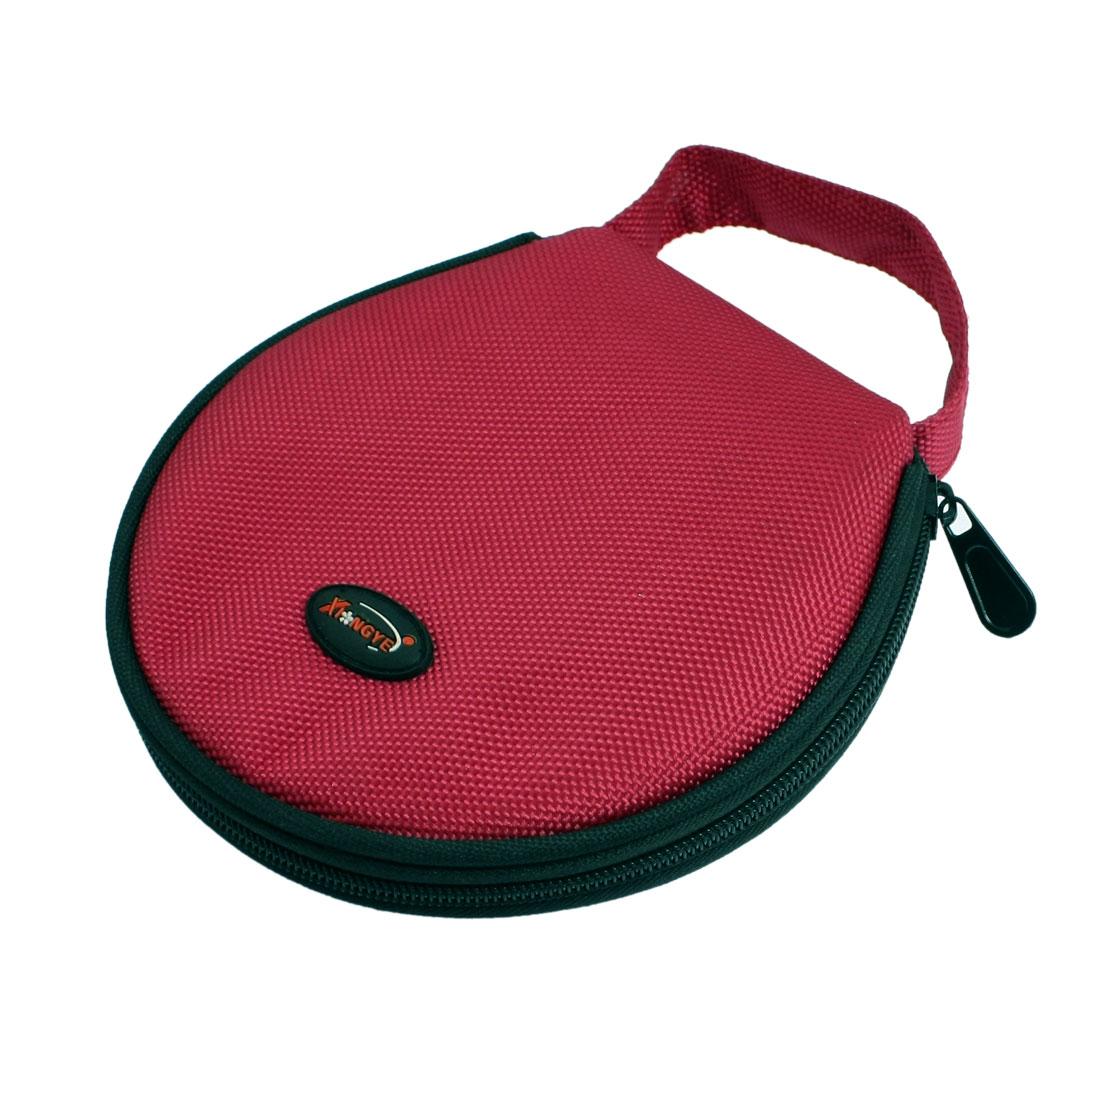 Red Nylon Zipper Closure 20 CDs Disc Holder Bag Organizer